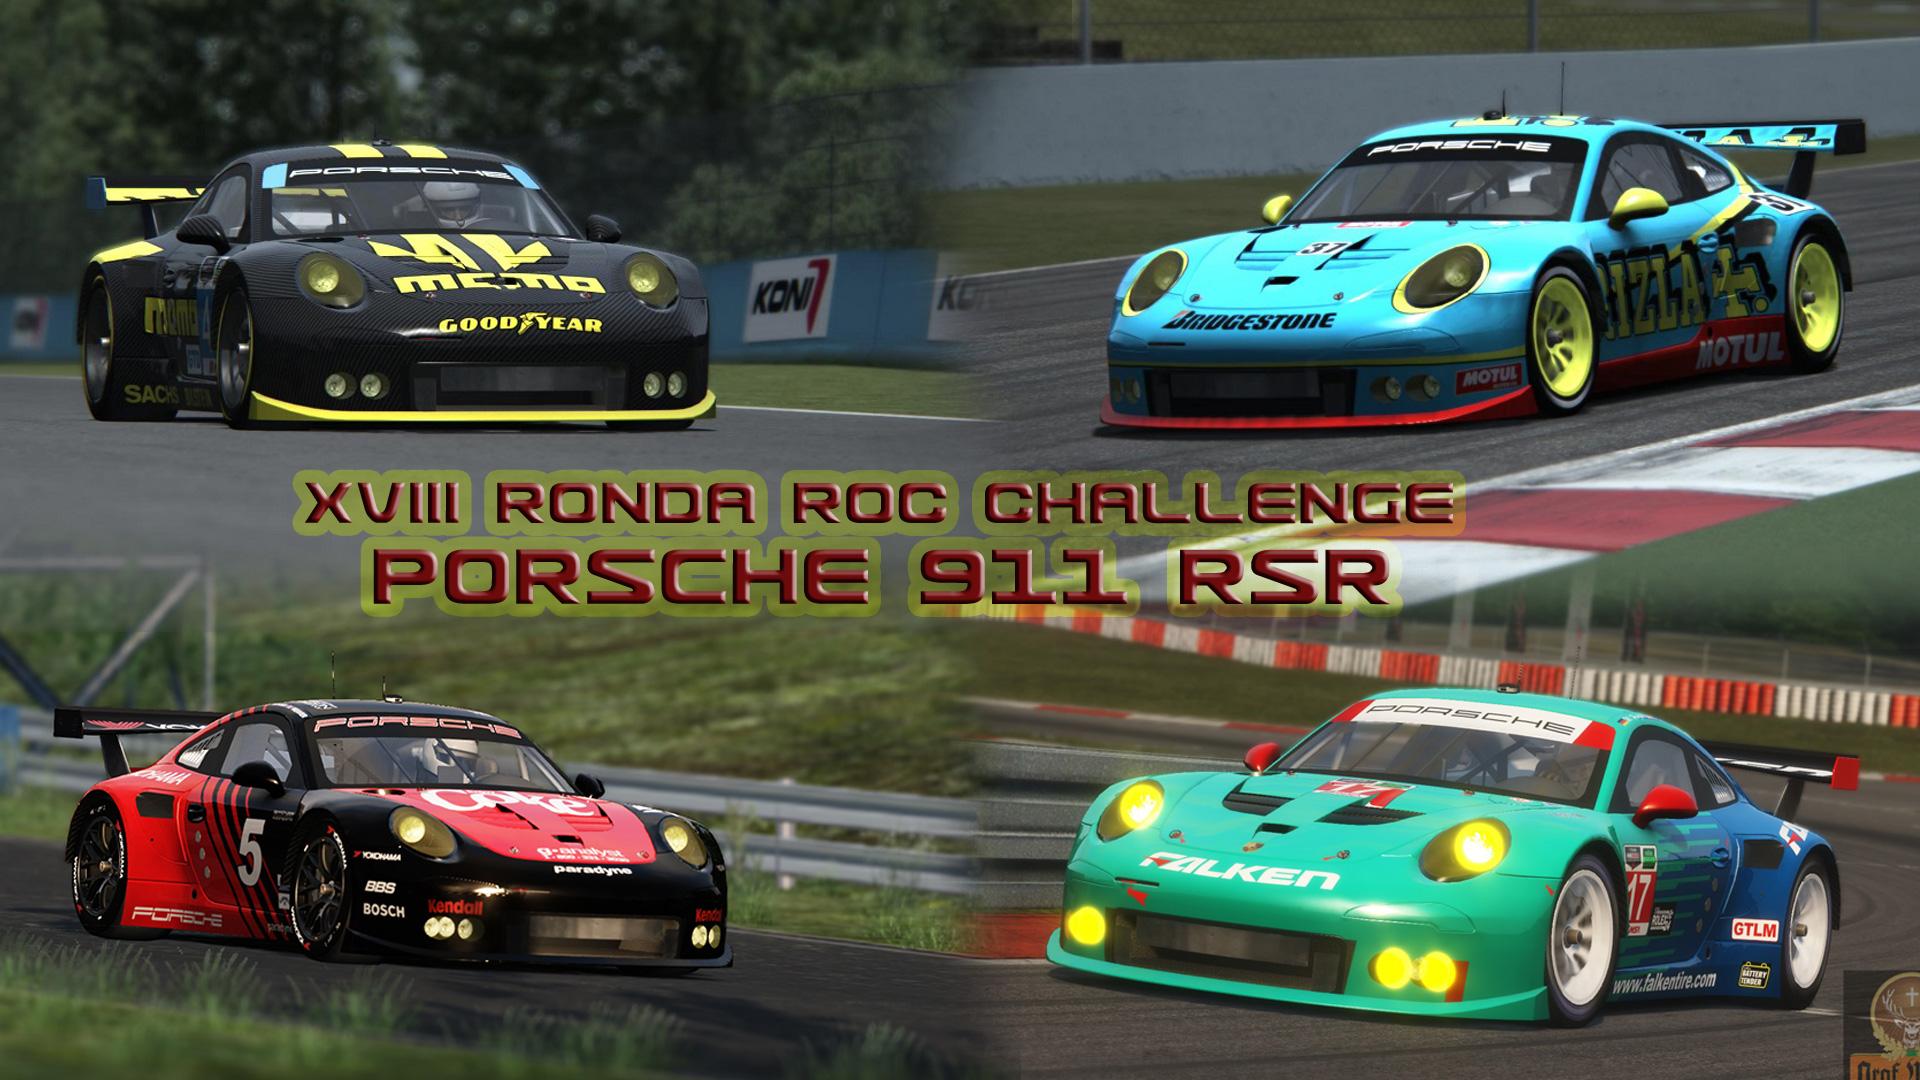 New Jersey (04/10) – Ronda XVIII ROC Challenge 911RSR